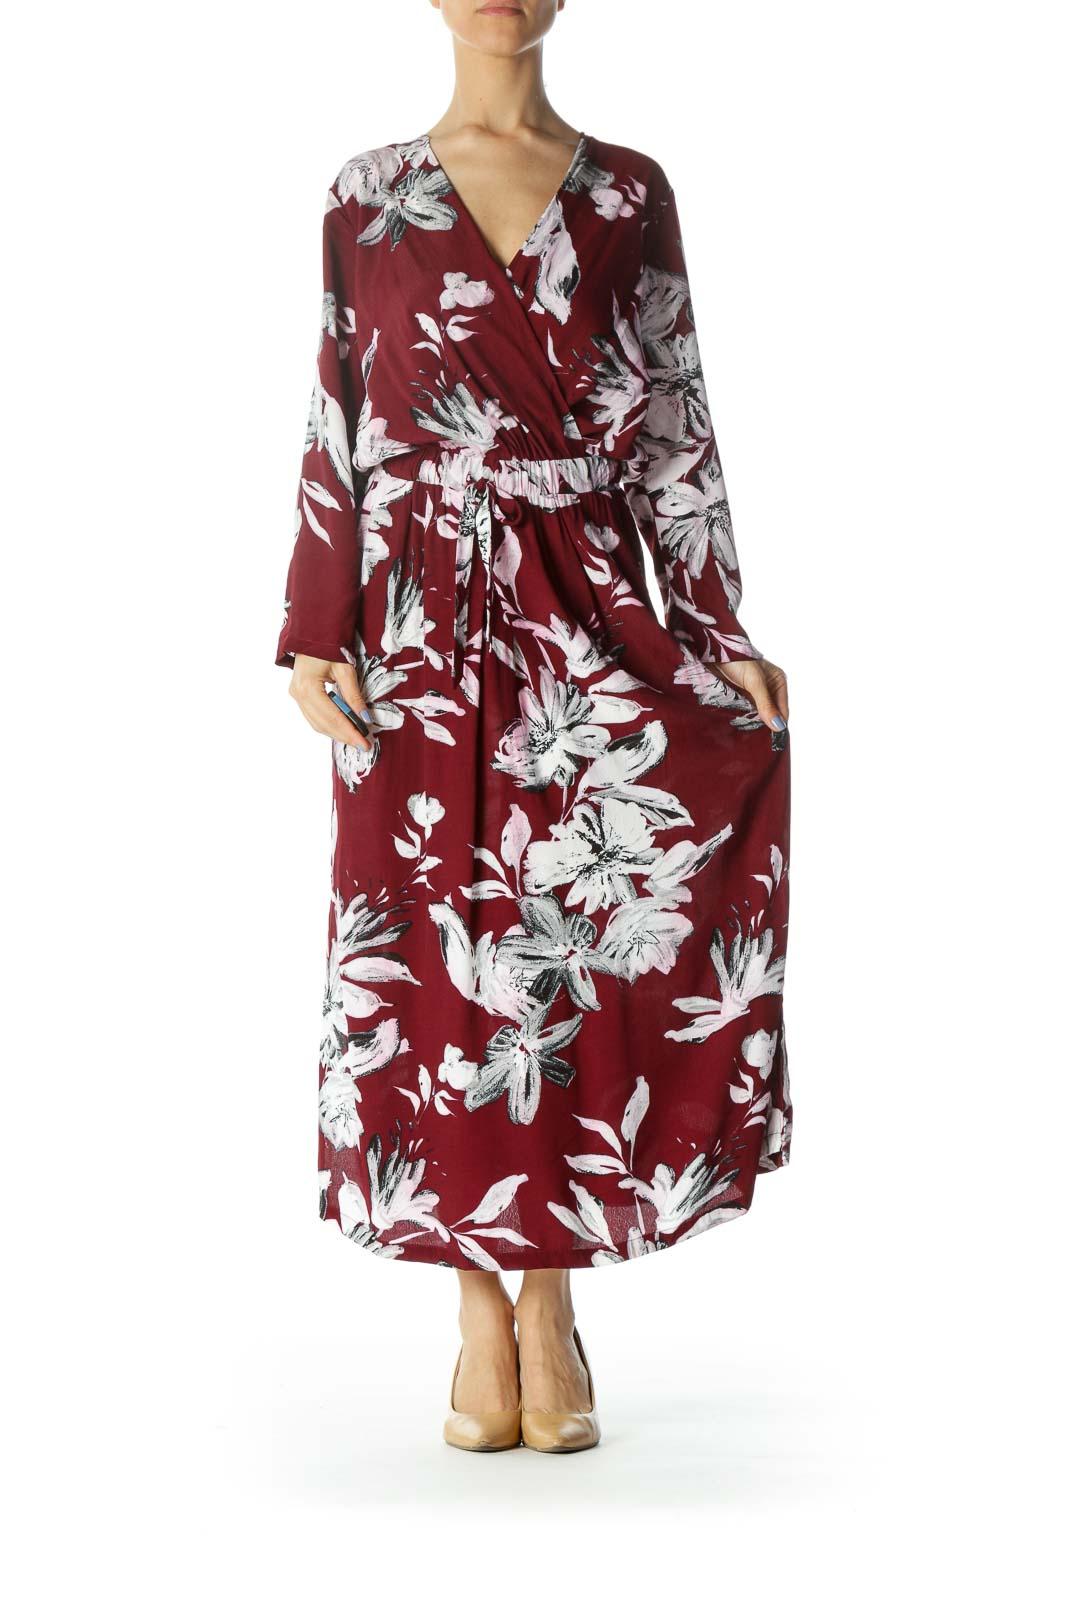 Burgundy/White/Black Flower-Print Pocketed Dress with Back String-Tie